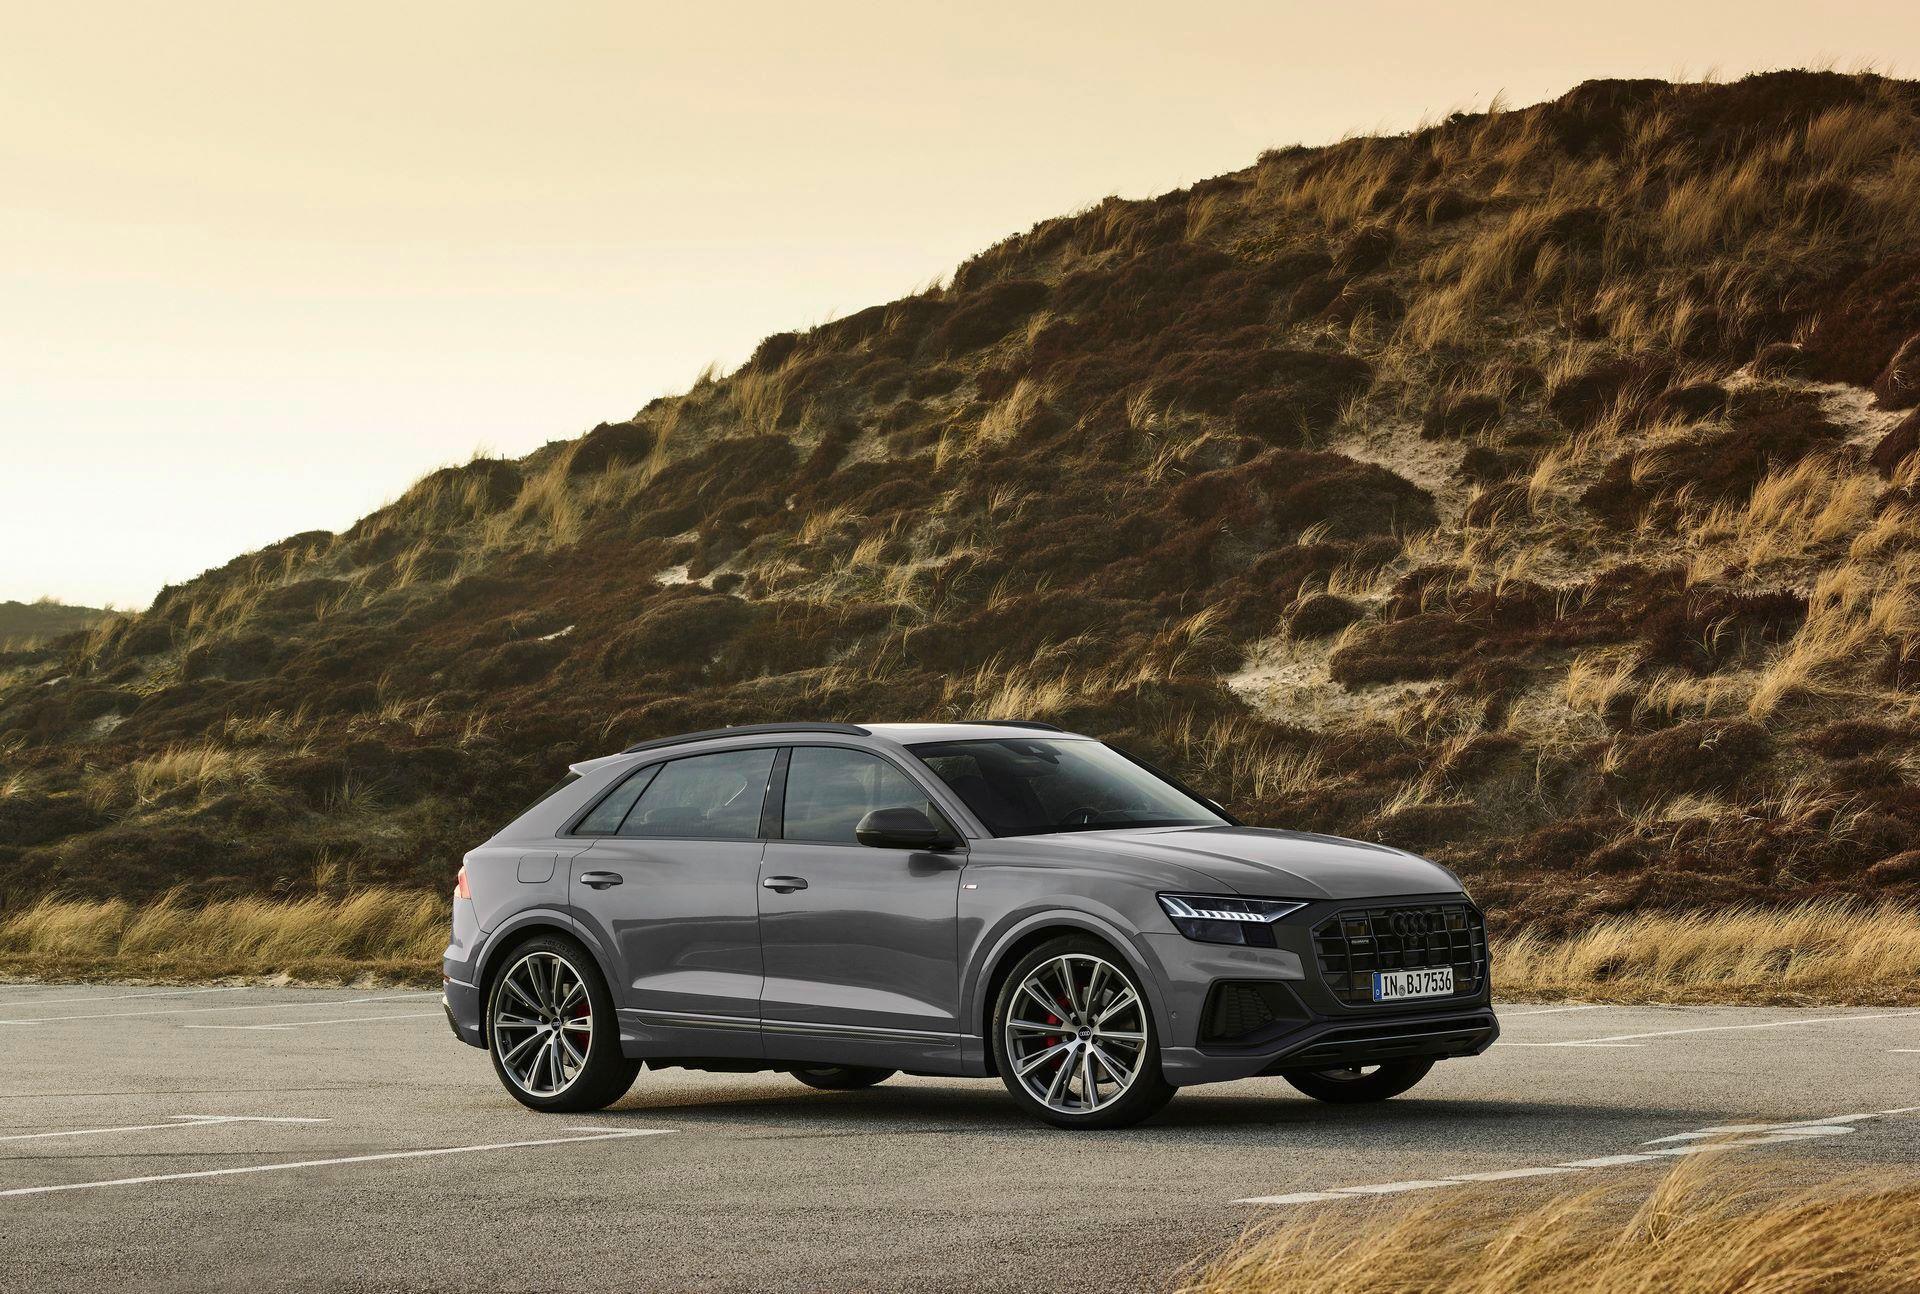 Audi-A4-A5-Q7-Q8-Competition-And-Competition-Plus-Trims-21